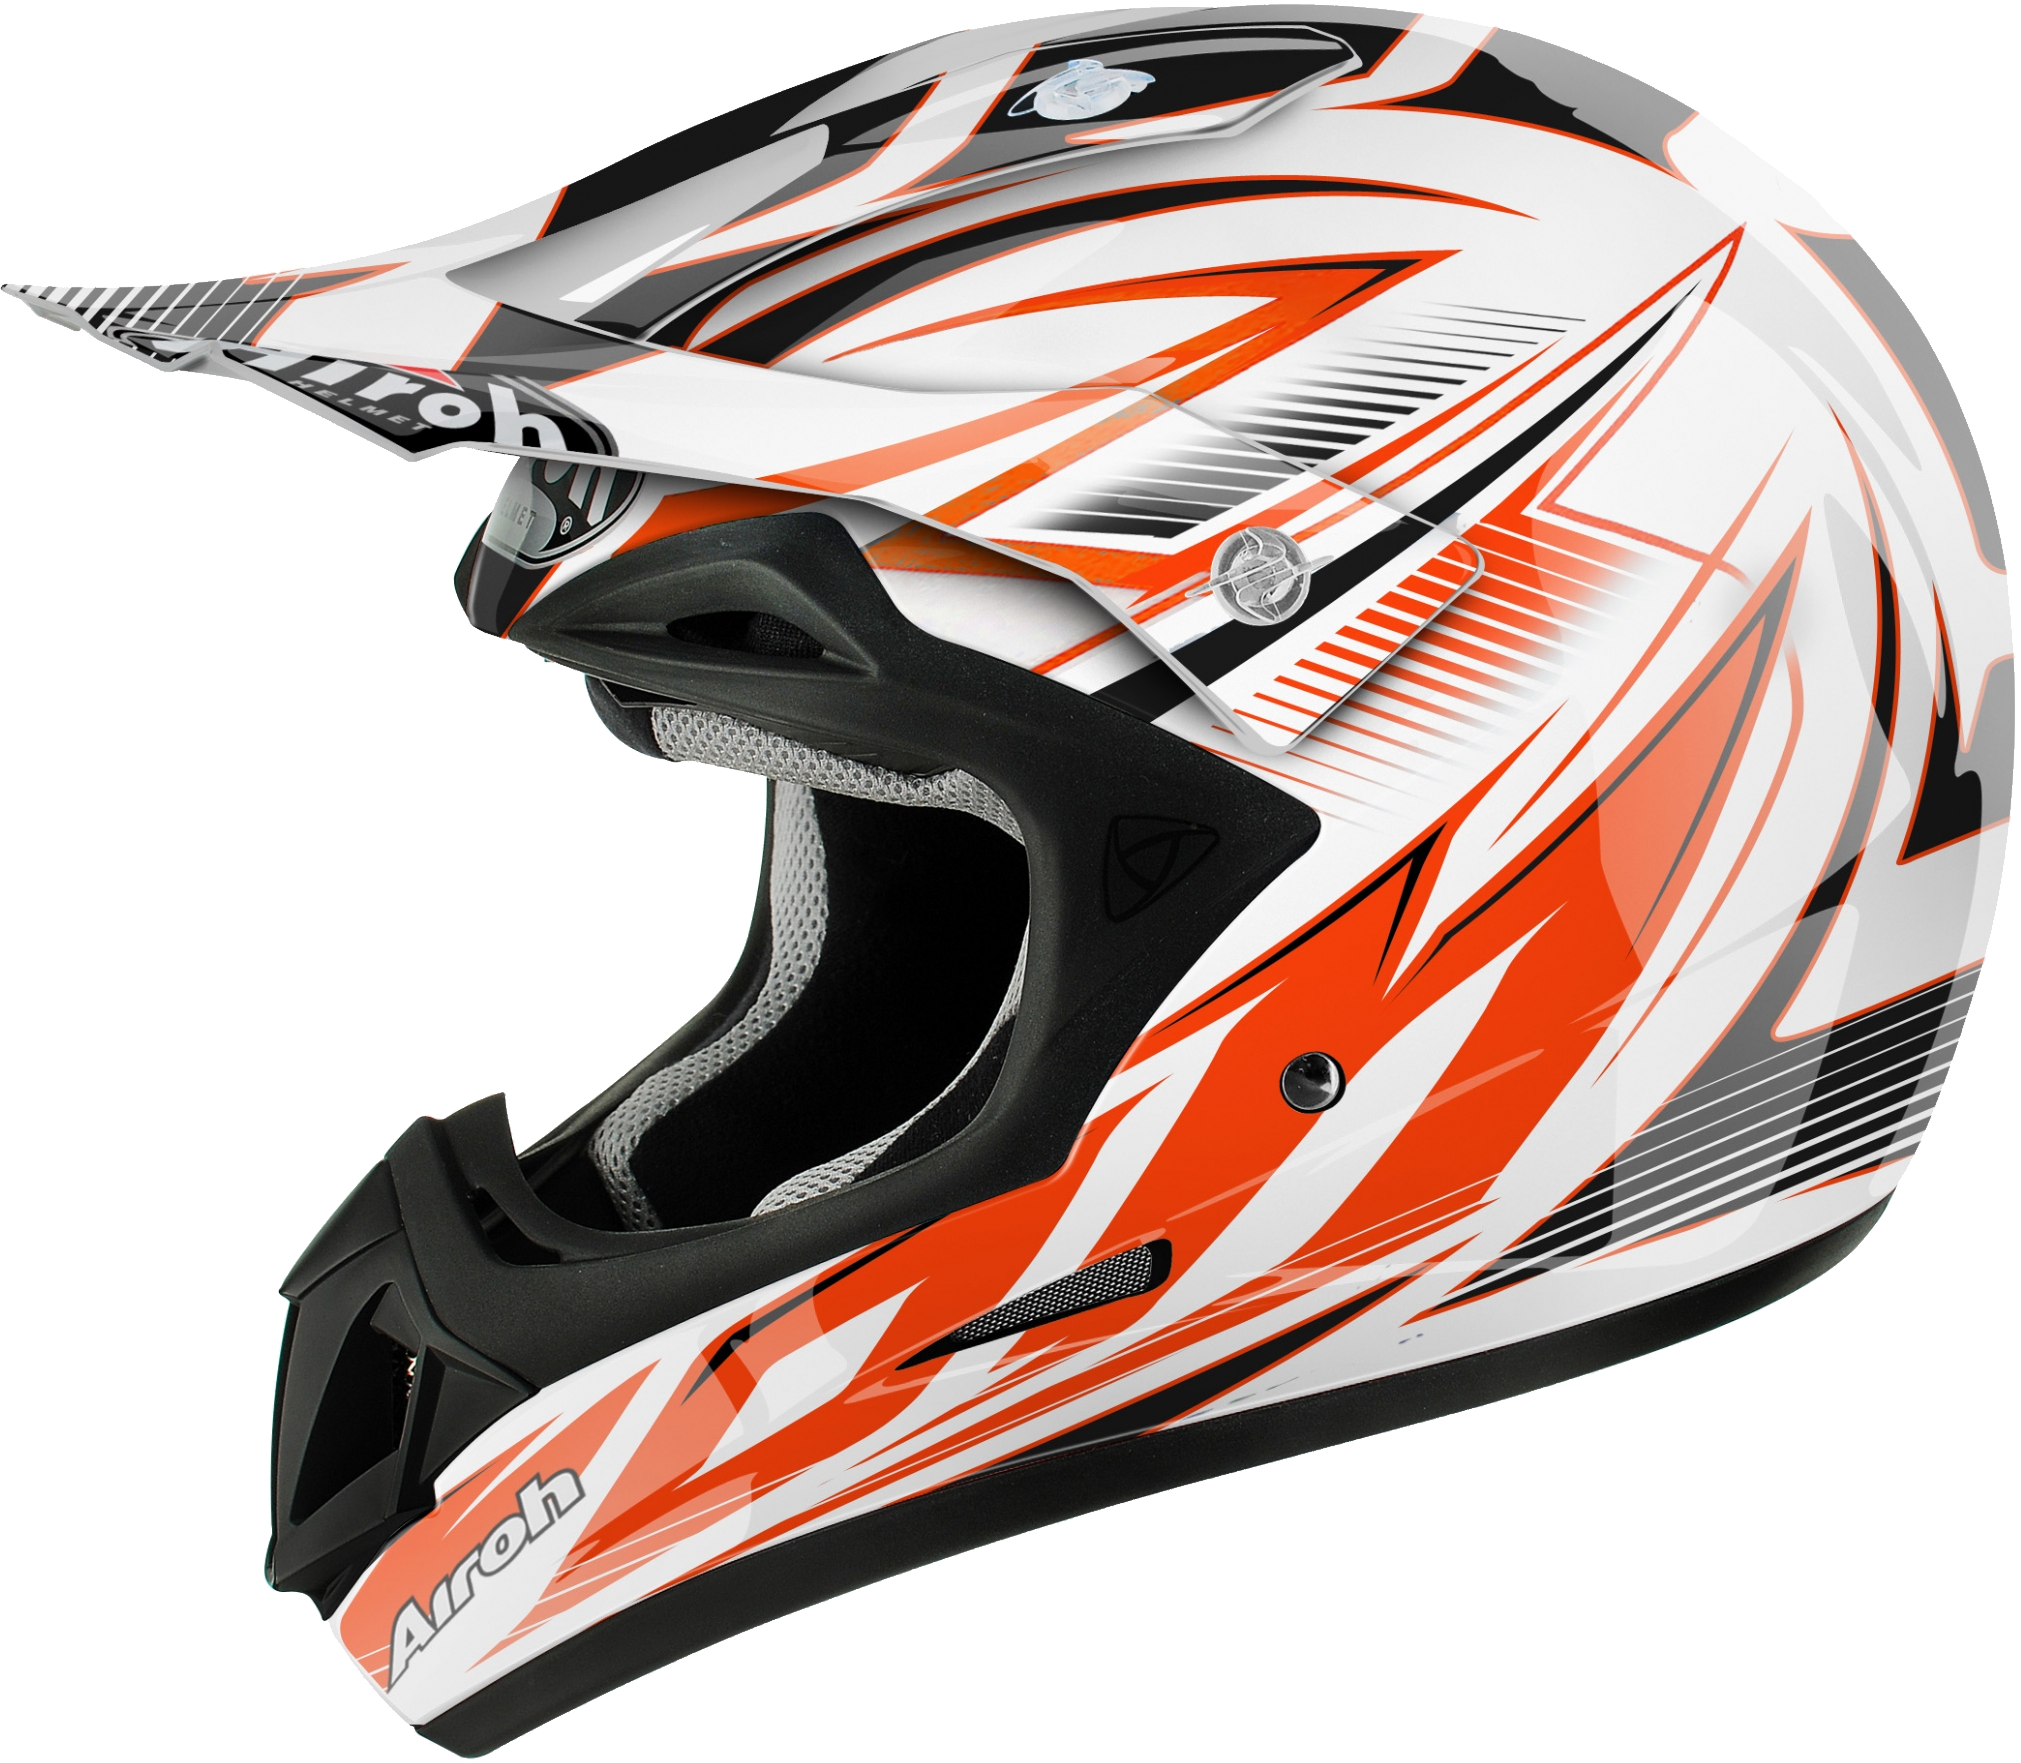 Bicycle Helmet Png Image Motocross Helmets Helmet Helmet Design